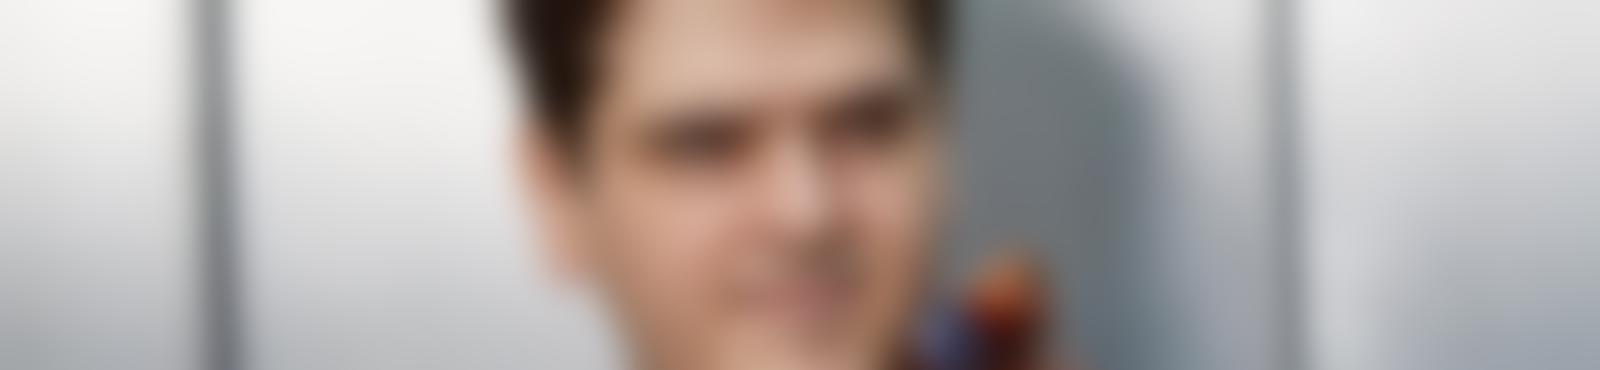 Blurred 66dfdc5c 50ce 4b42 9643 eca94b98ef4d